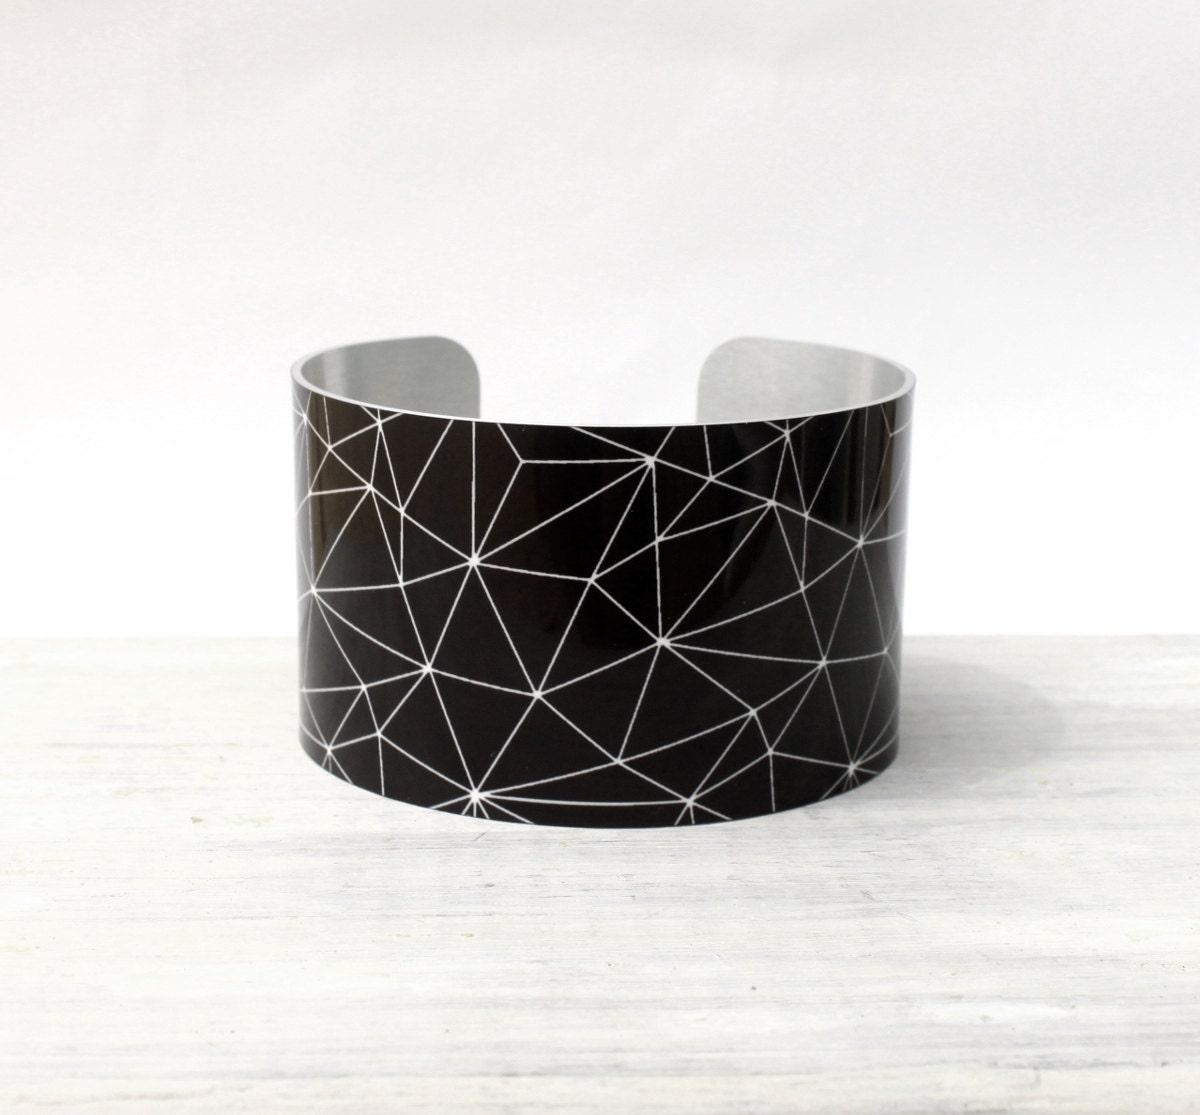 STARR Cuff Bracelet - Metal Cuff - Aluminum Cuff Bracelet - Large Bold Bracelet - Wide Cuff Jewelry - Geometric Web Bracelet - PeaceLoveBeach